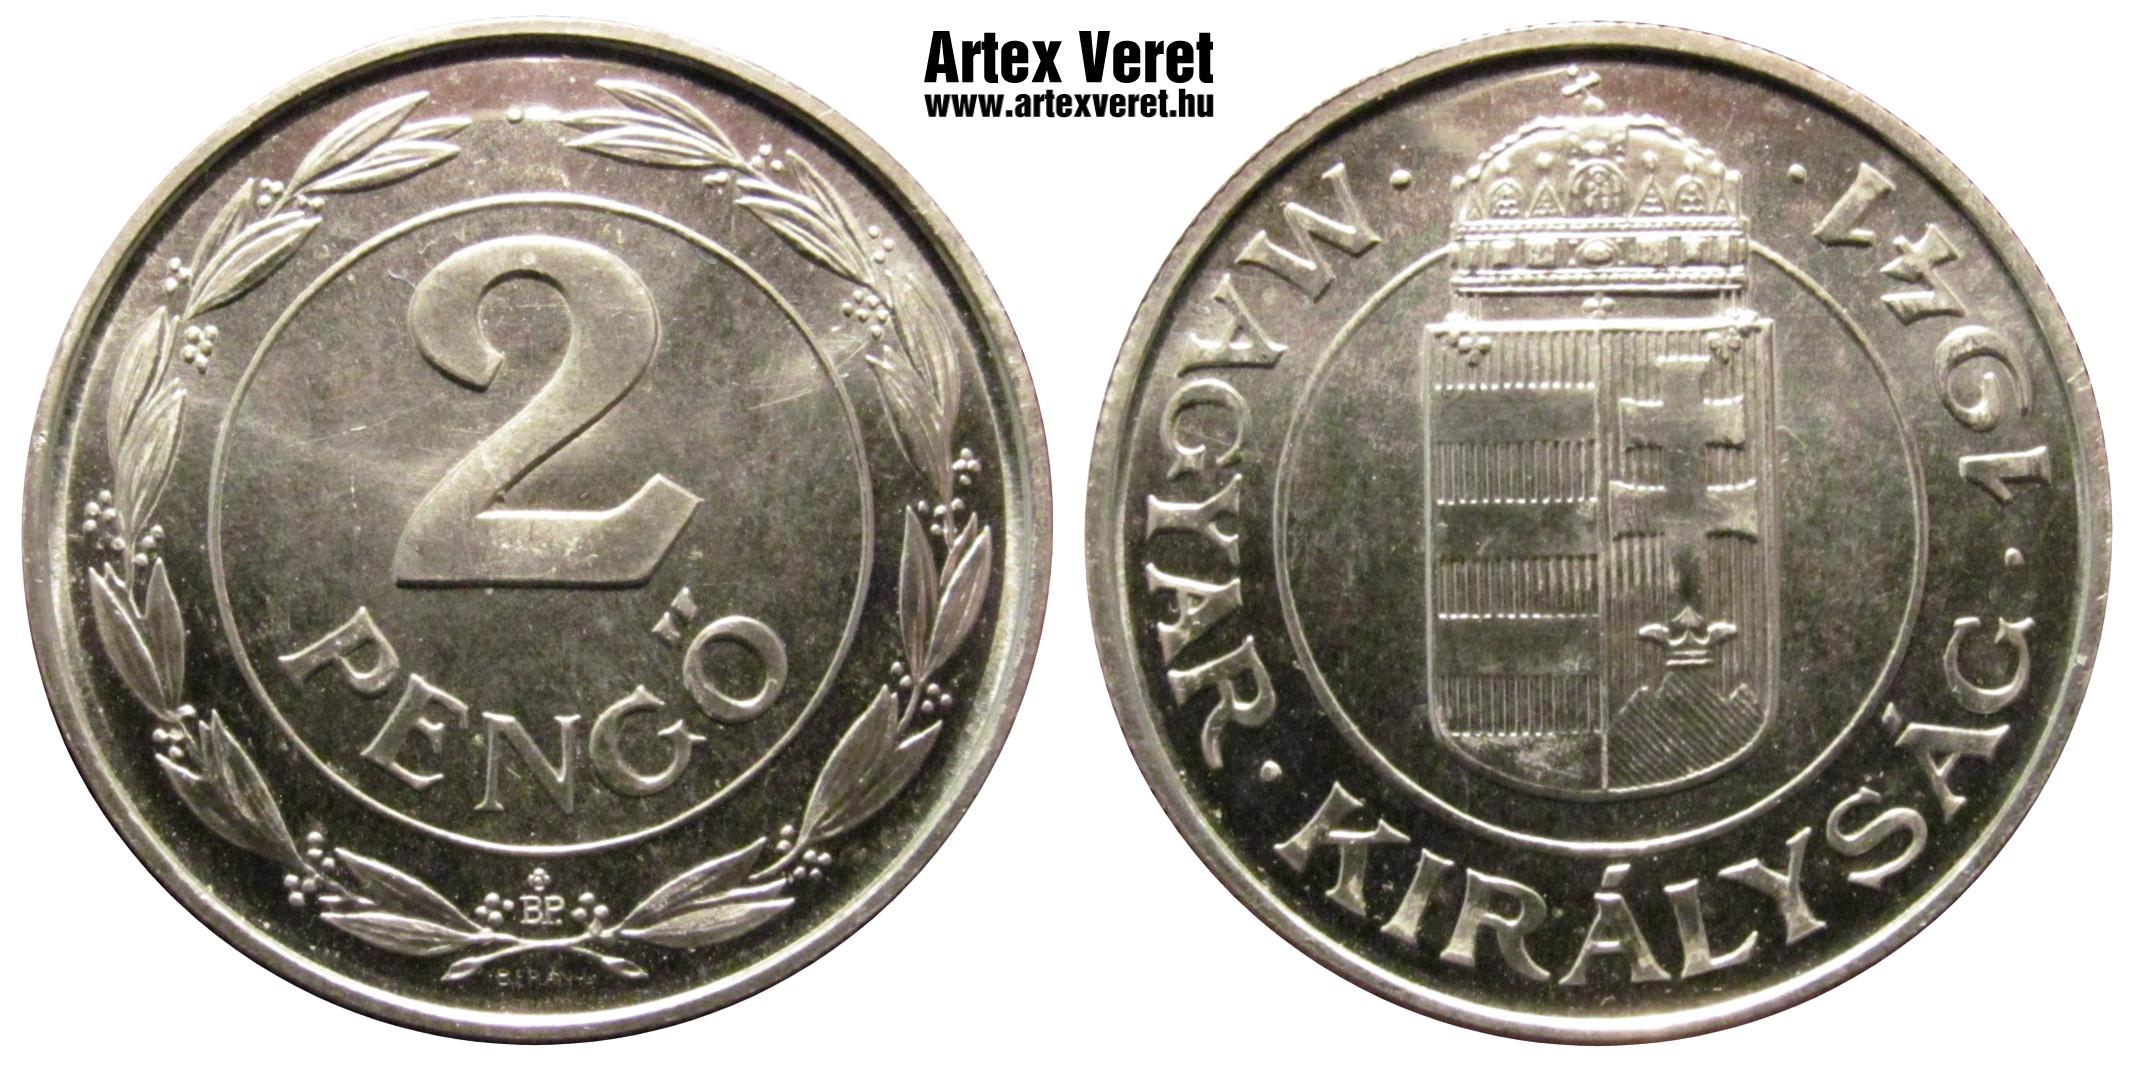 http://www.artexveret.hu/pengo-artex-utanveret/www_artexveret_hu_aluminium_1941_rozettas_sima-talpu_artex_utanveret_2_pengo.jpg